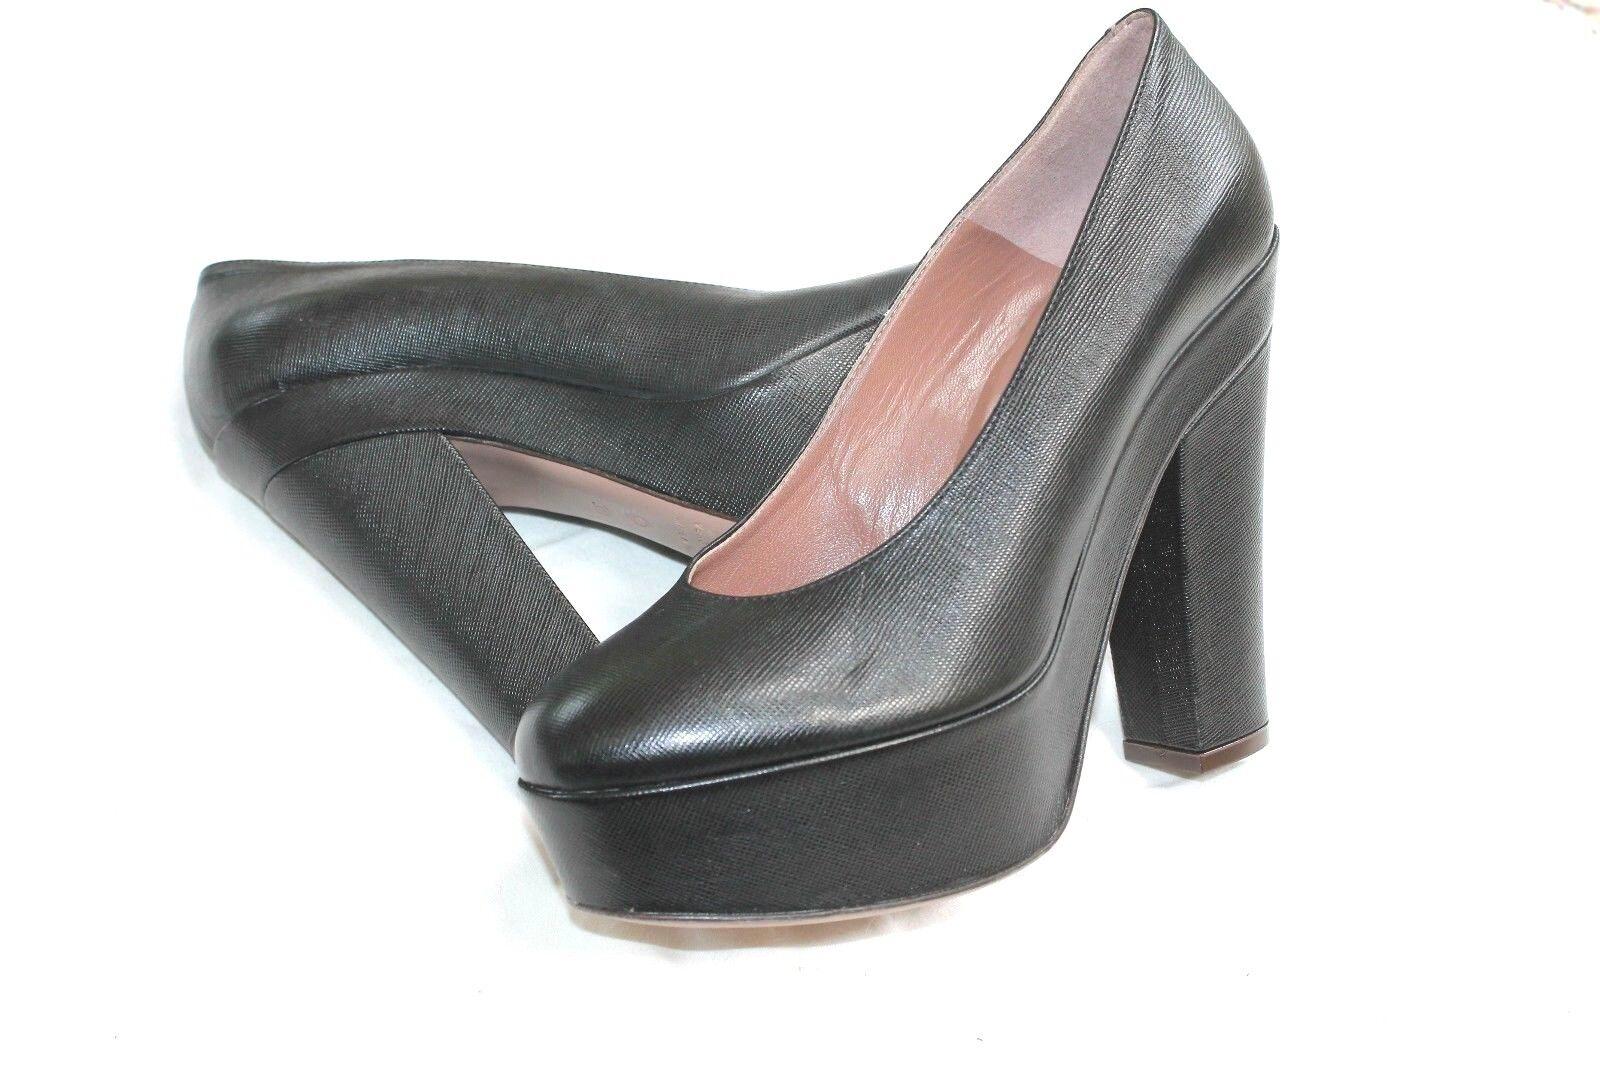 L'Autre Chos Pebbled Pebbled Pebbled Leather Mega Chunky Platforms Heels 39 Size 8.5 OL'Autre 92ff25